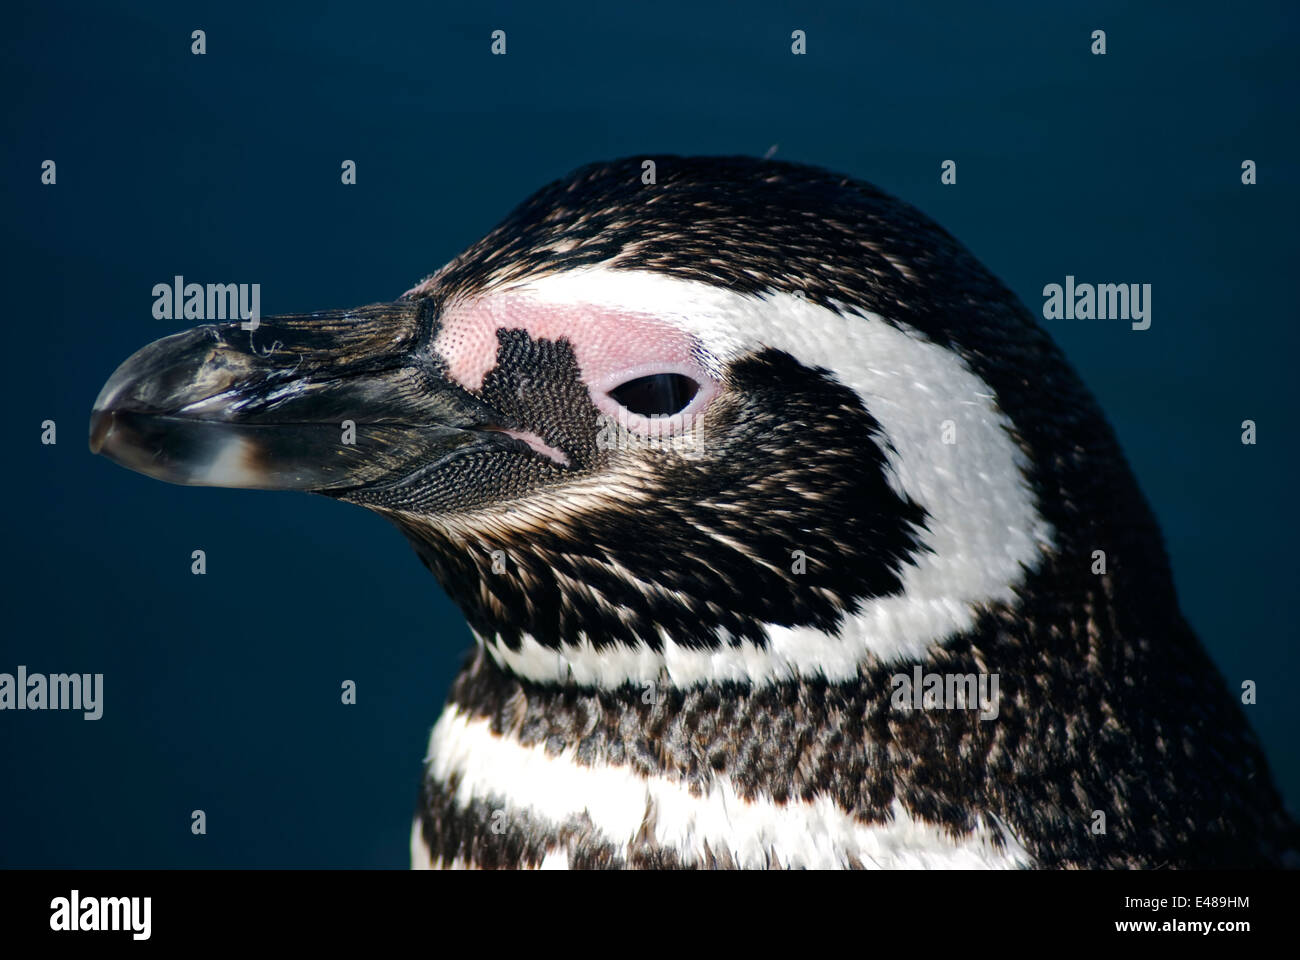 Magellan penguin. Torres del Paine National Park, Chile. - Stock Image